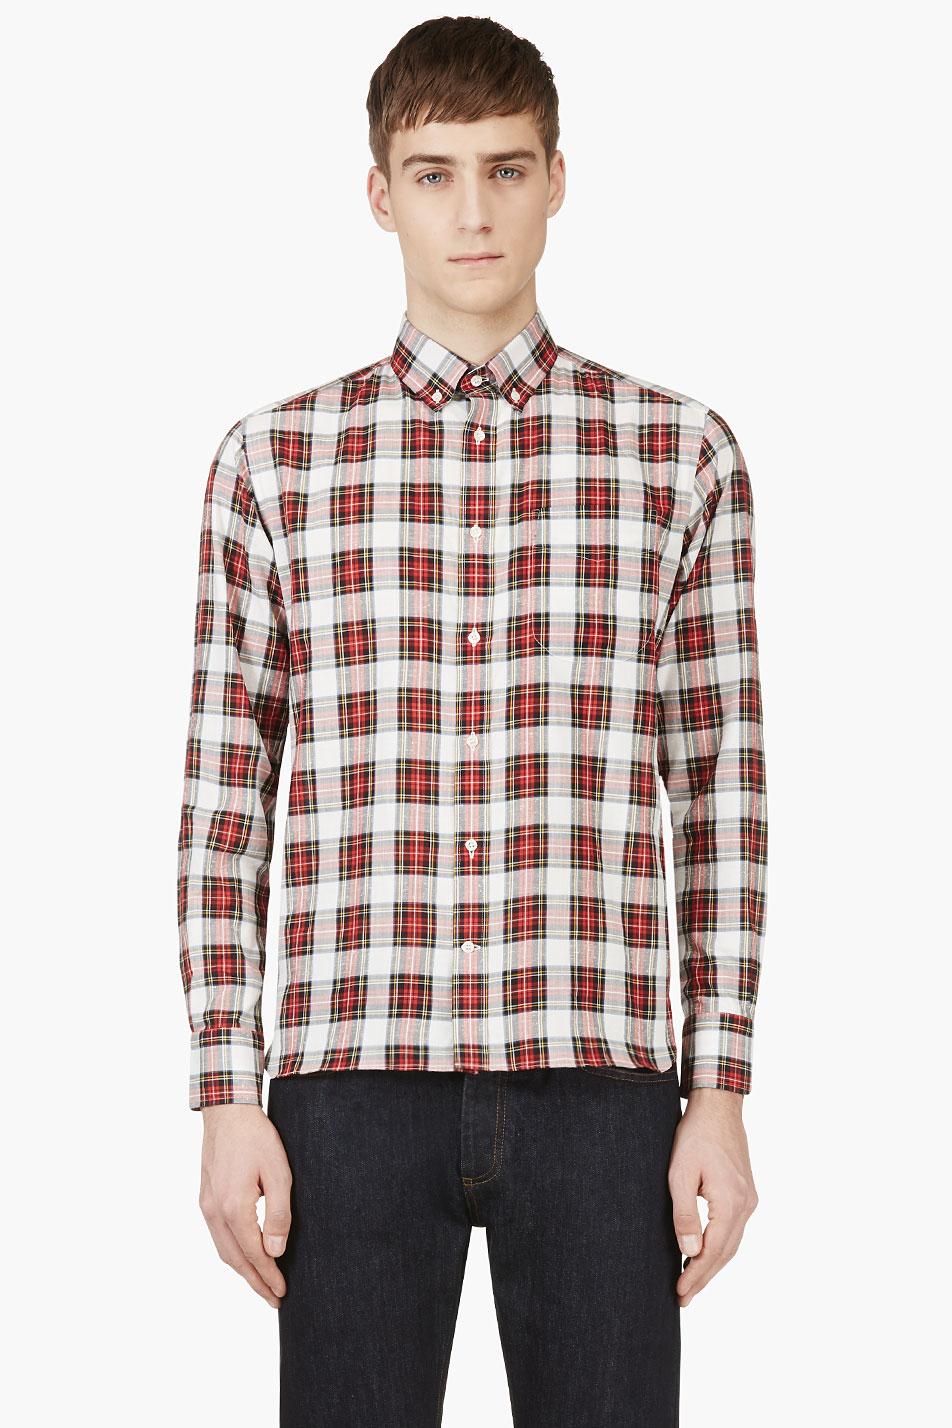 maison kitsun red and white plaid button_down shirt